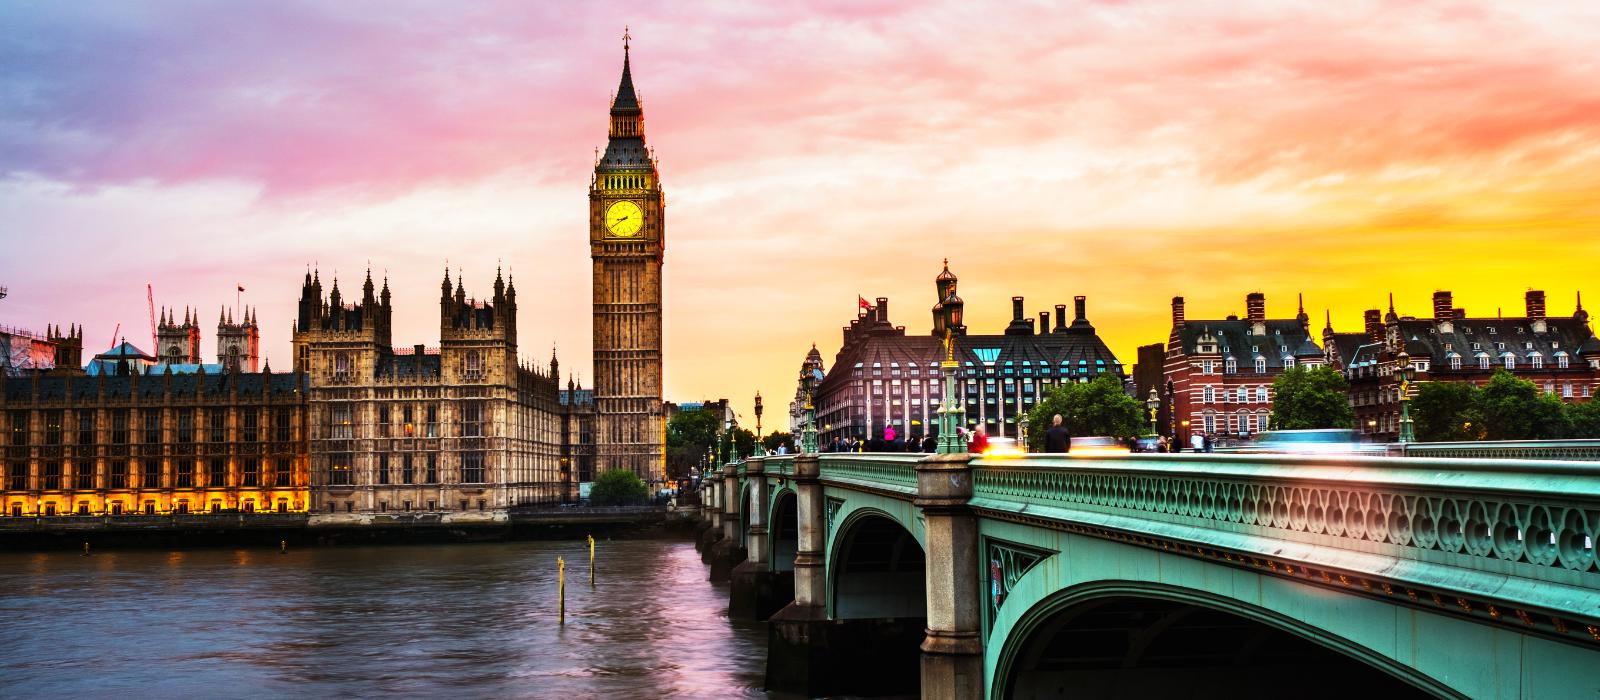 London, Our spiritual home, Inspiration & History